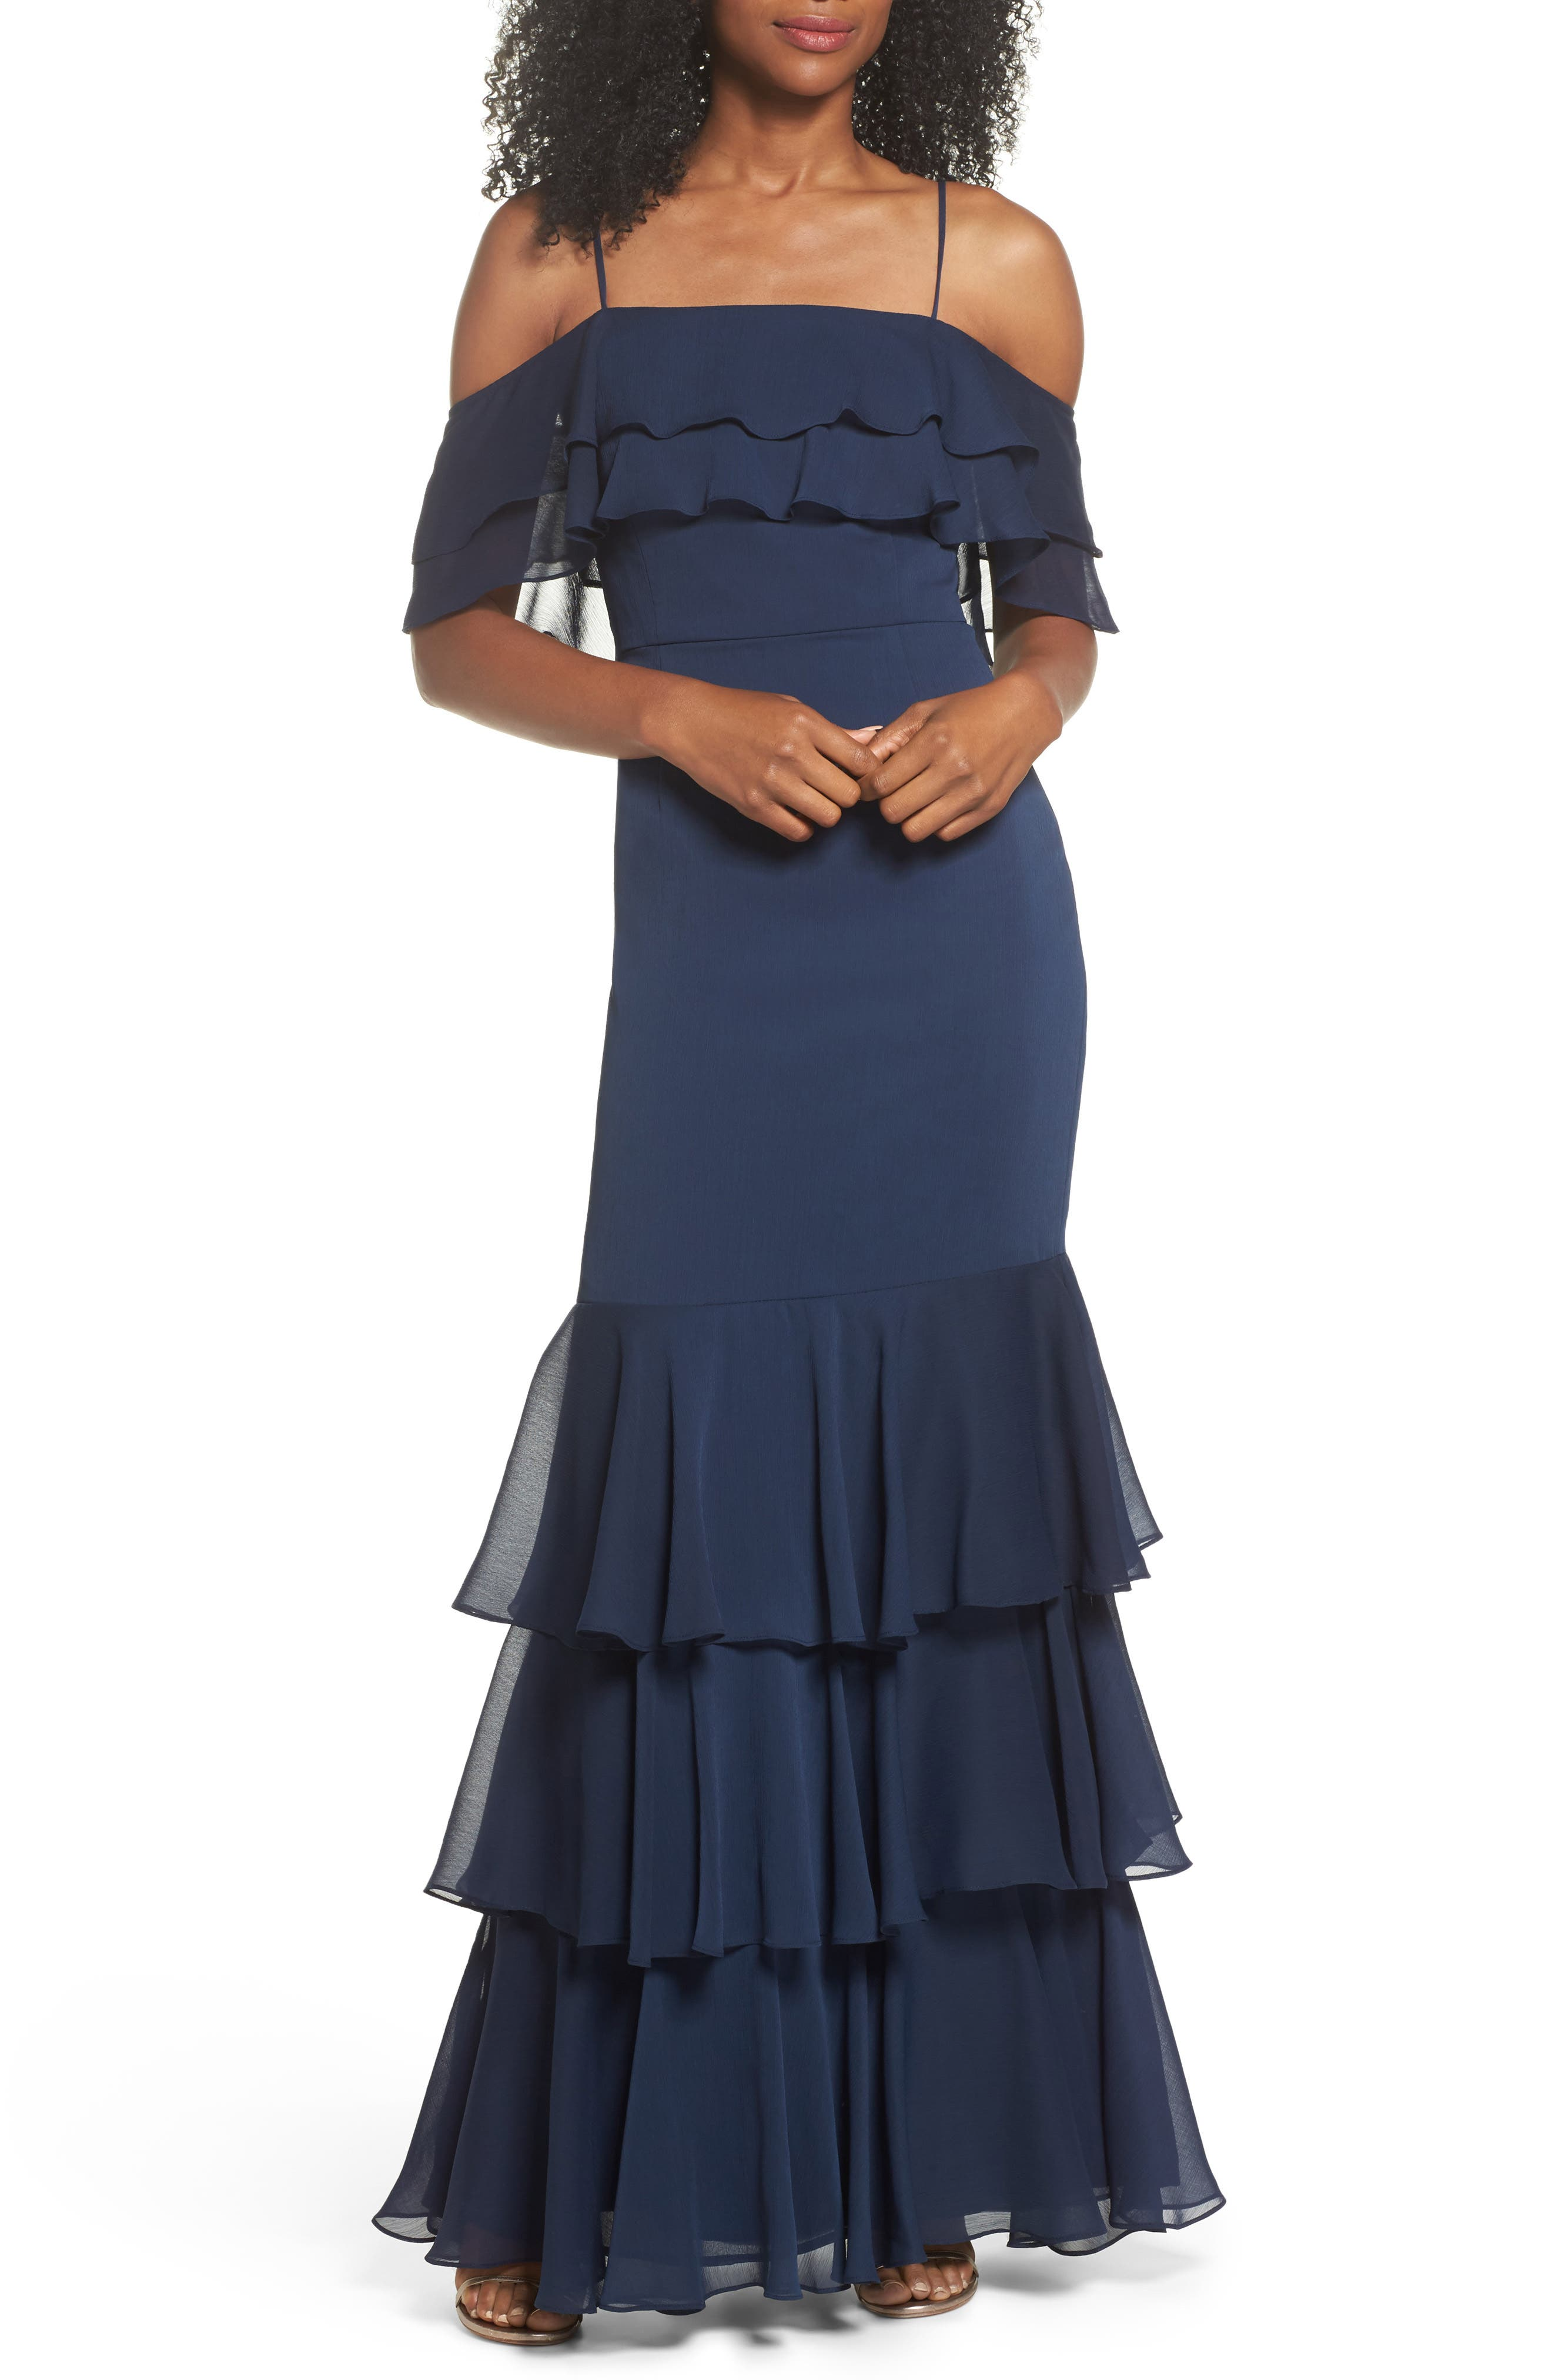 Lauren Cold Shoulder Tiered Gown,                             Main thumbnail 1, color,                             Navy